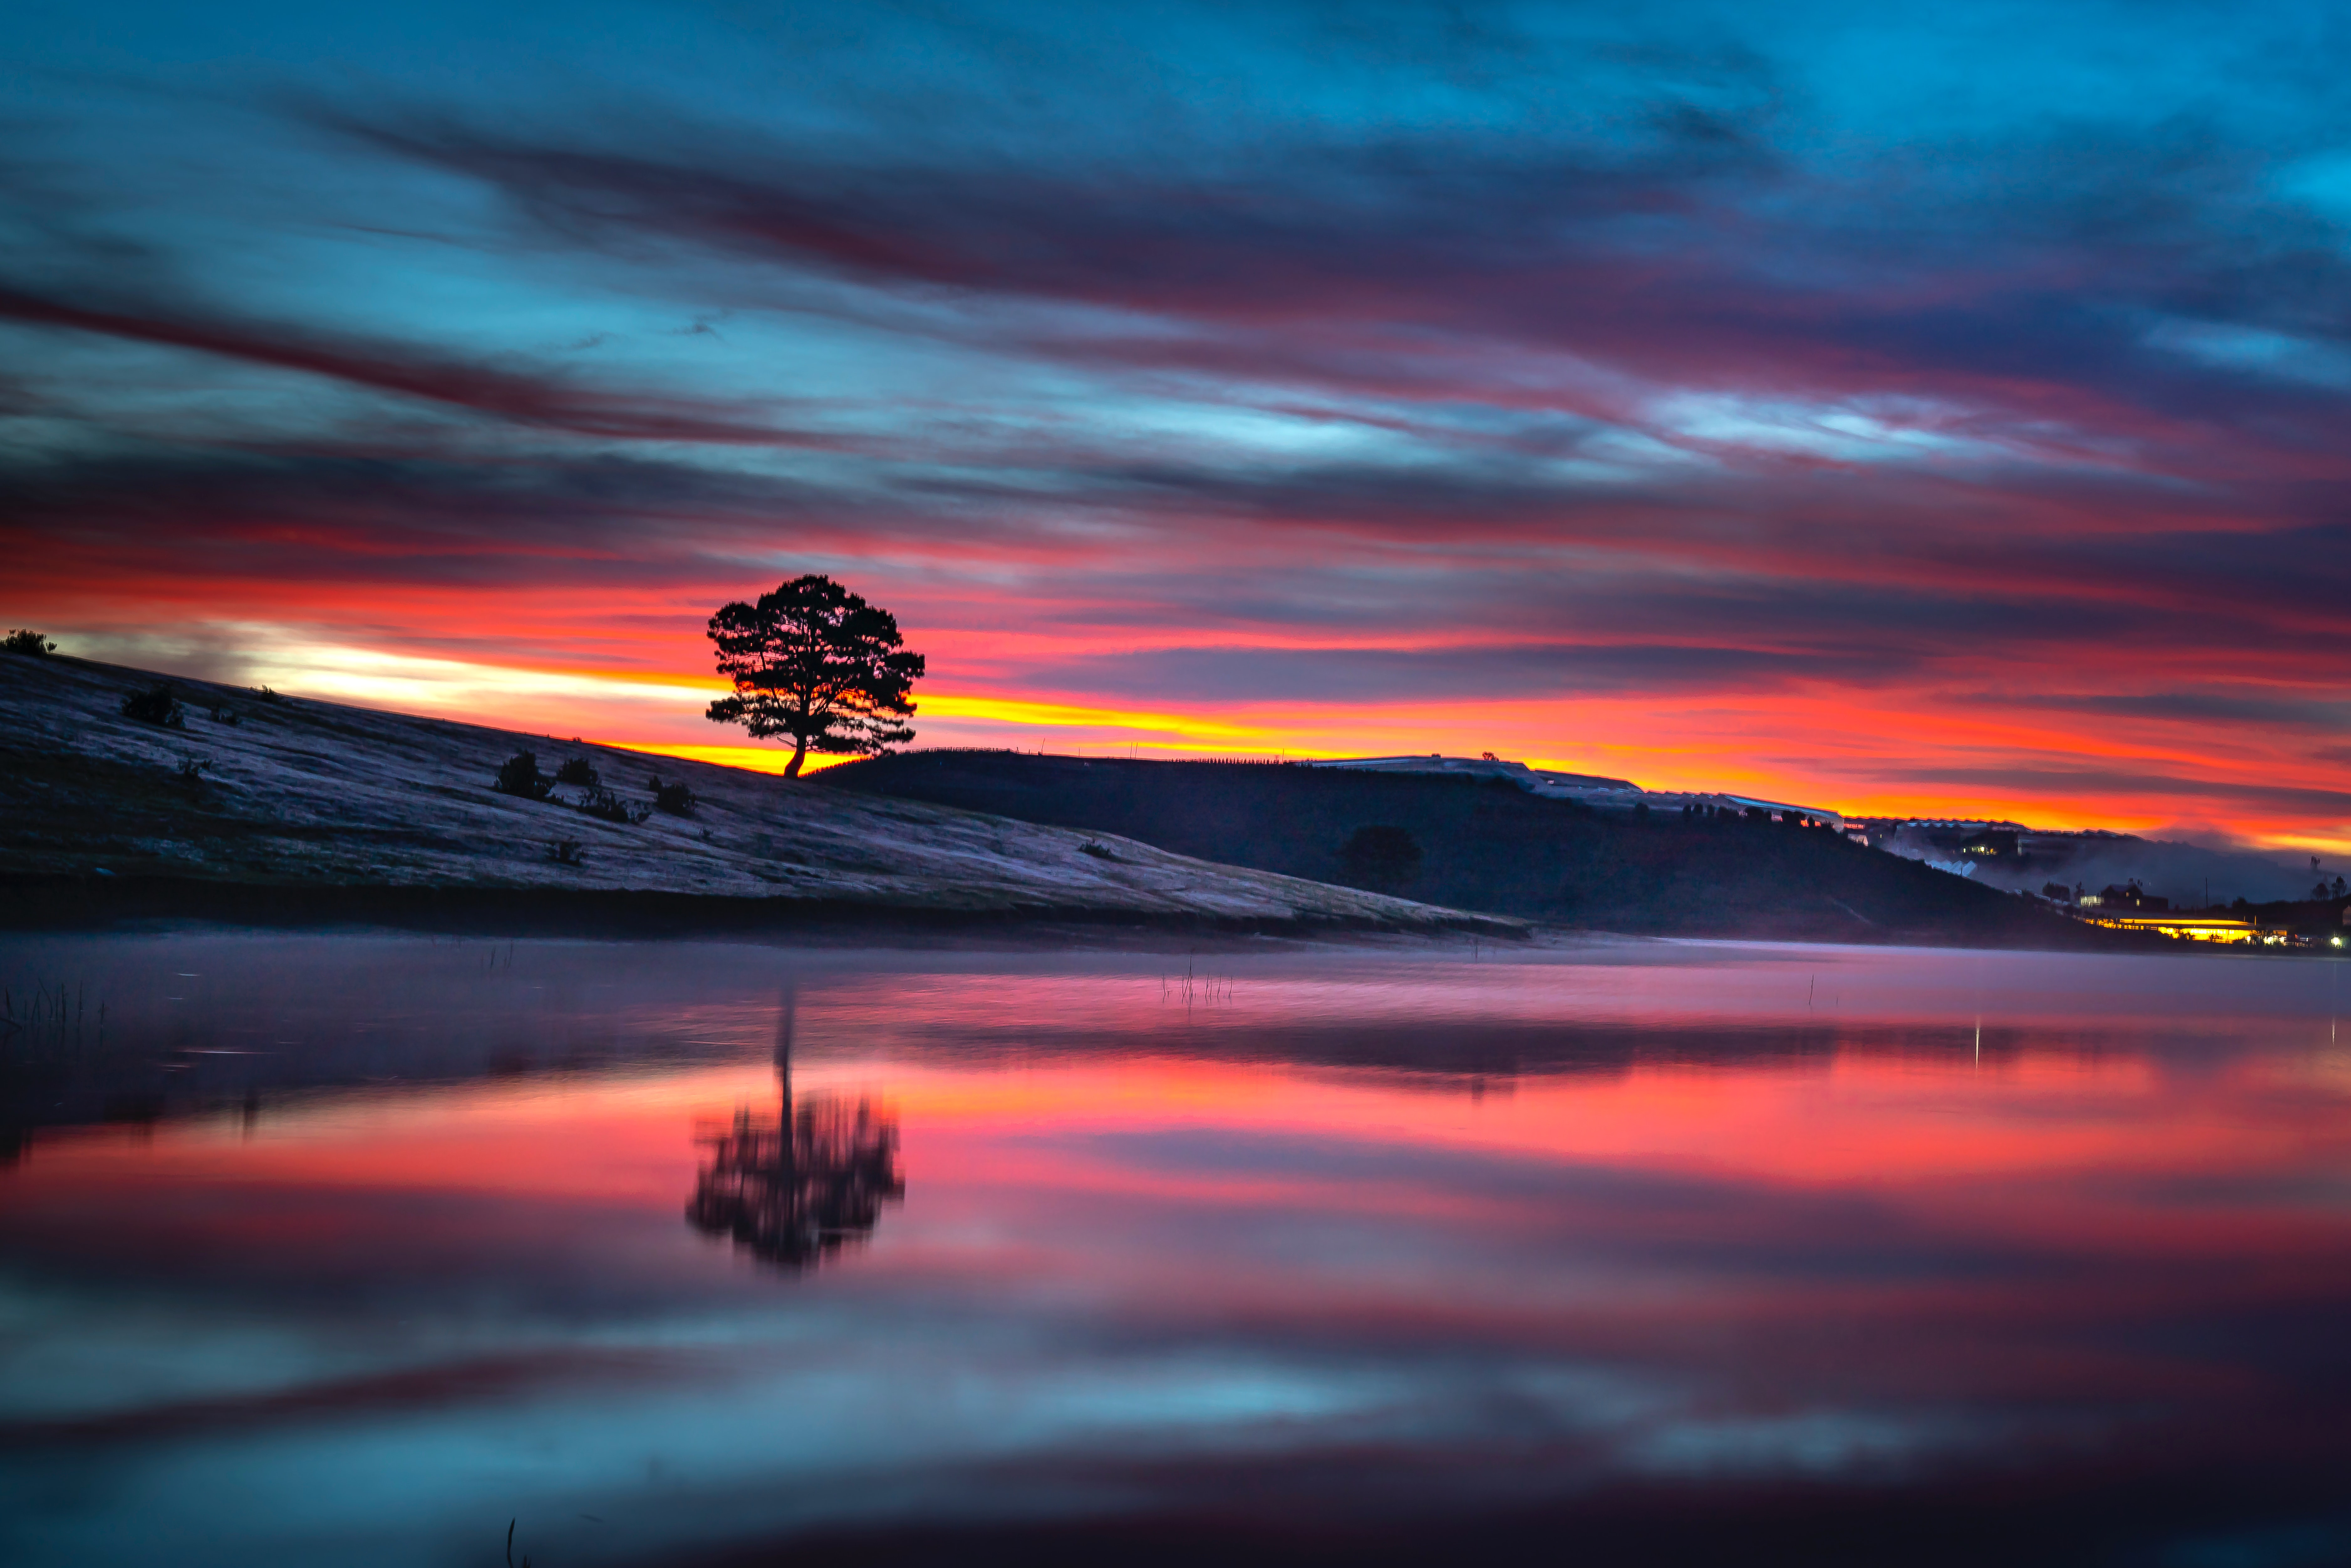 reflection tree body 1574937372 - Reflection Tree Body -